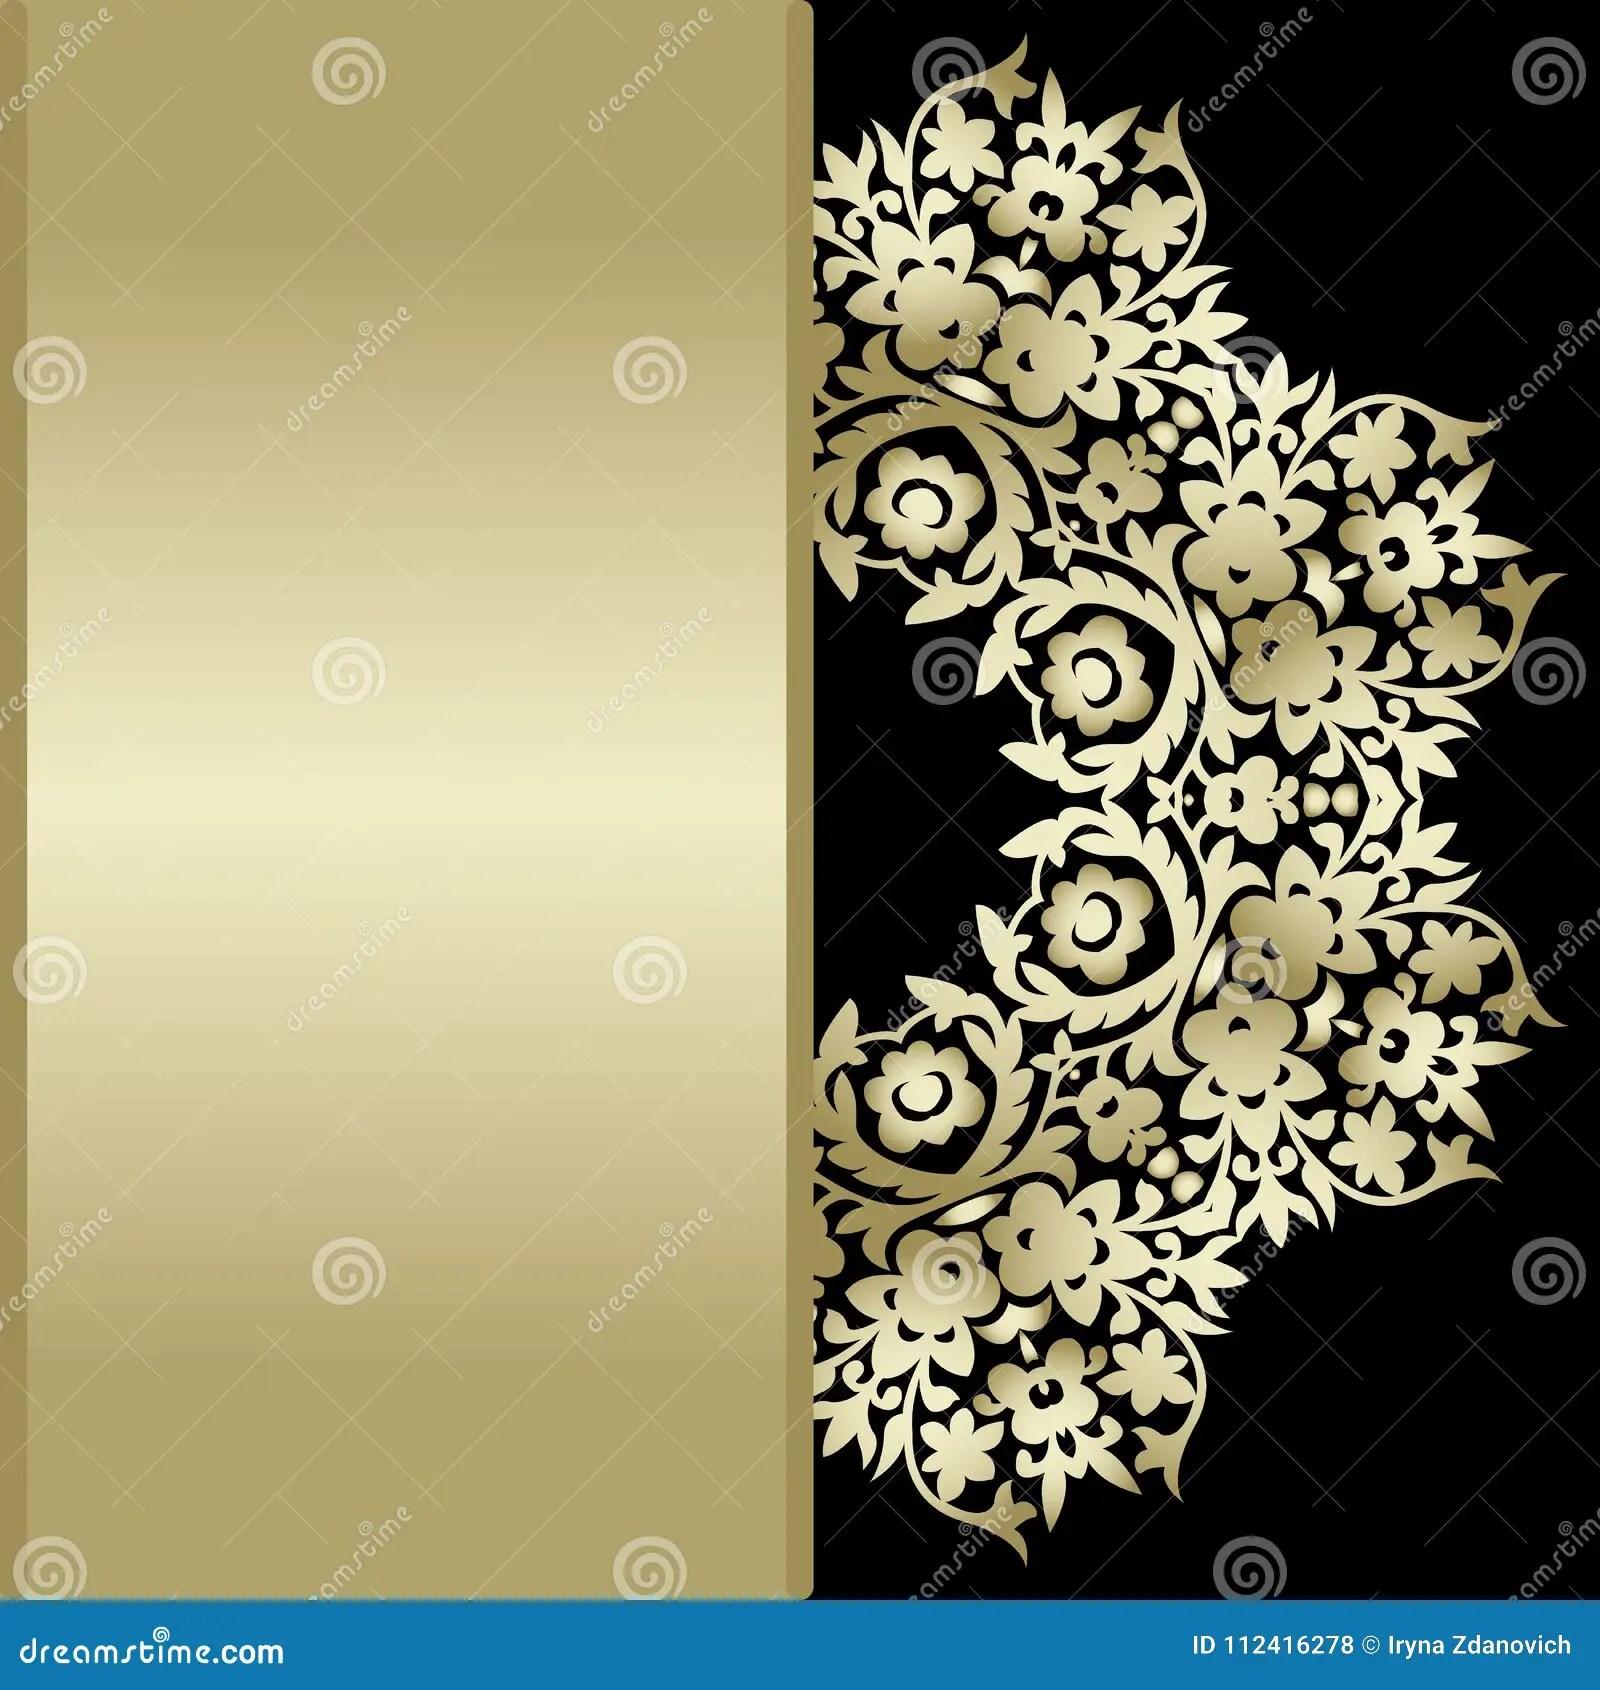 https www dreamstime com blank vertical stripe label invitation card wedding blank vertical stripe label invitation card wedding image112416278